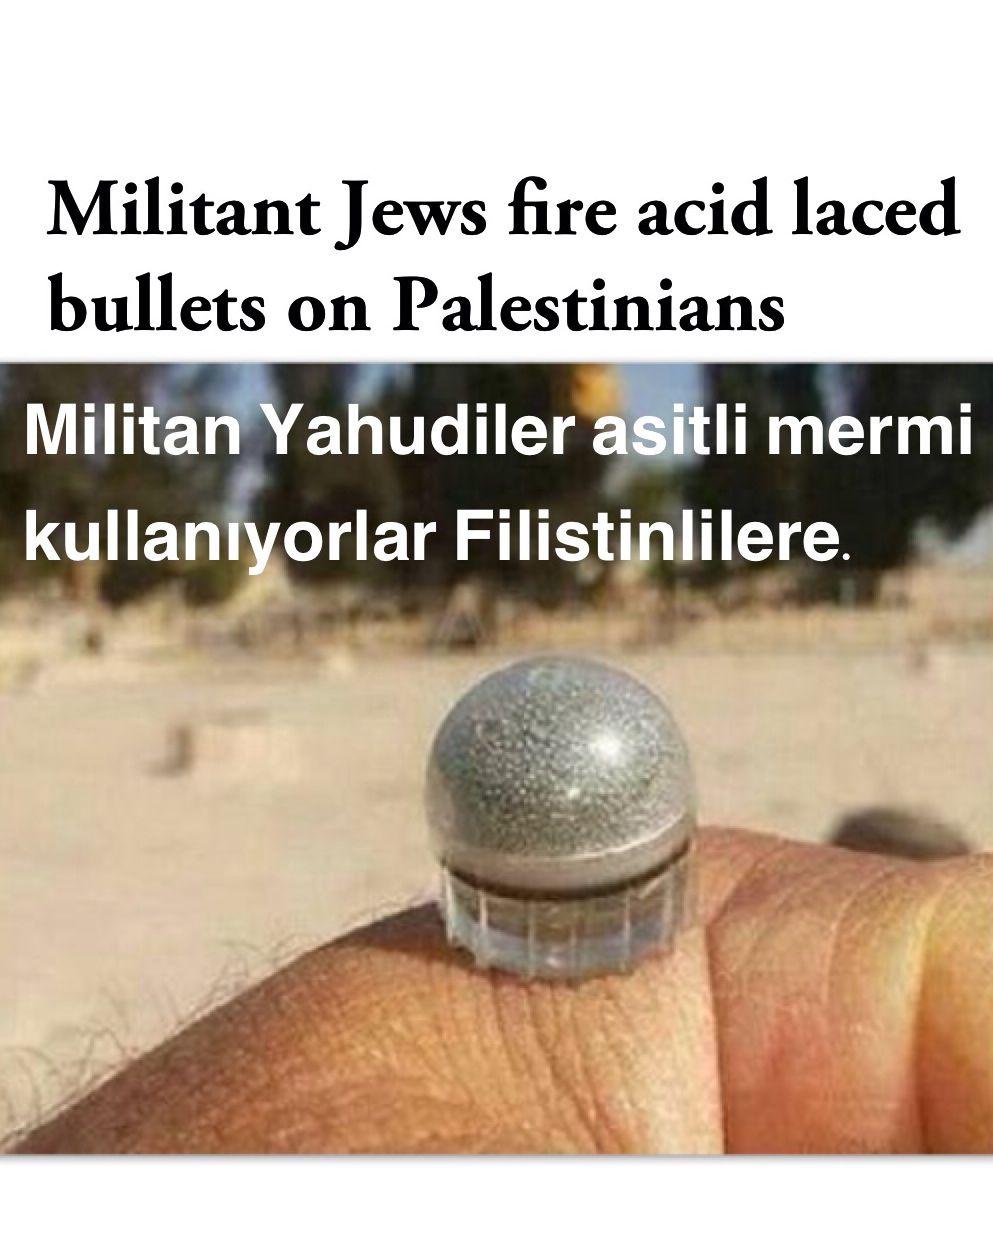 2014 Occupation & Colonization of Palestine #palestina #filistin #turkish - BBC Show is anti-Palestine -